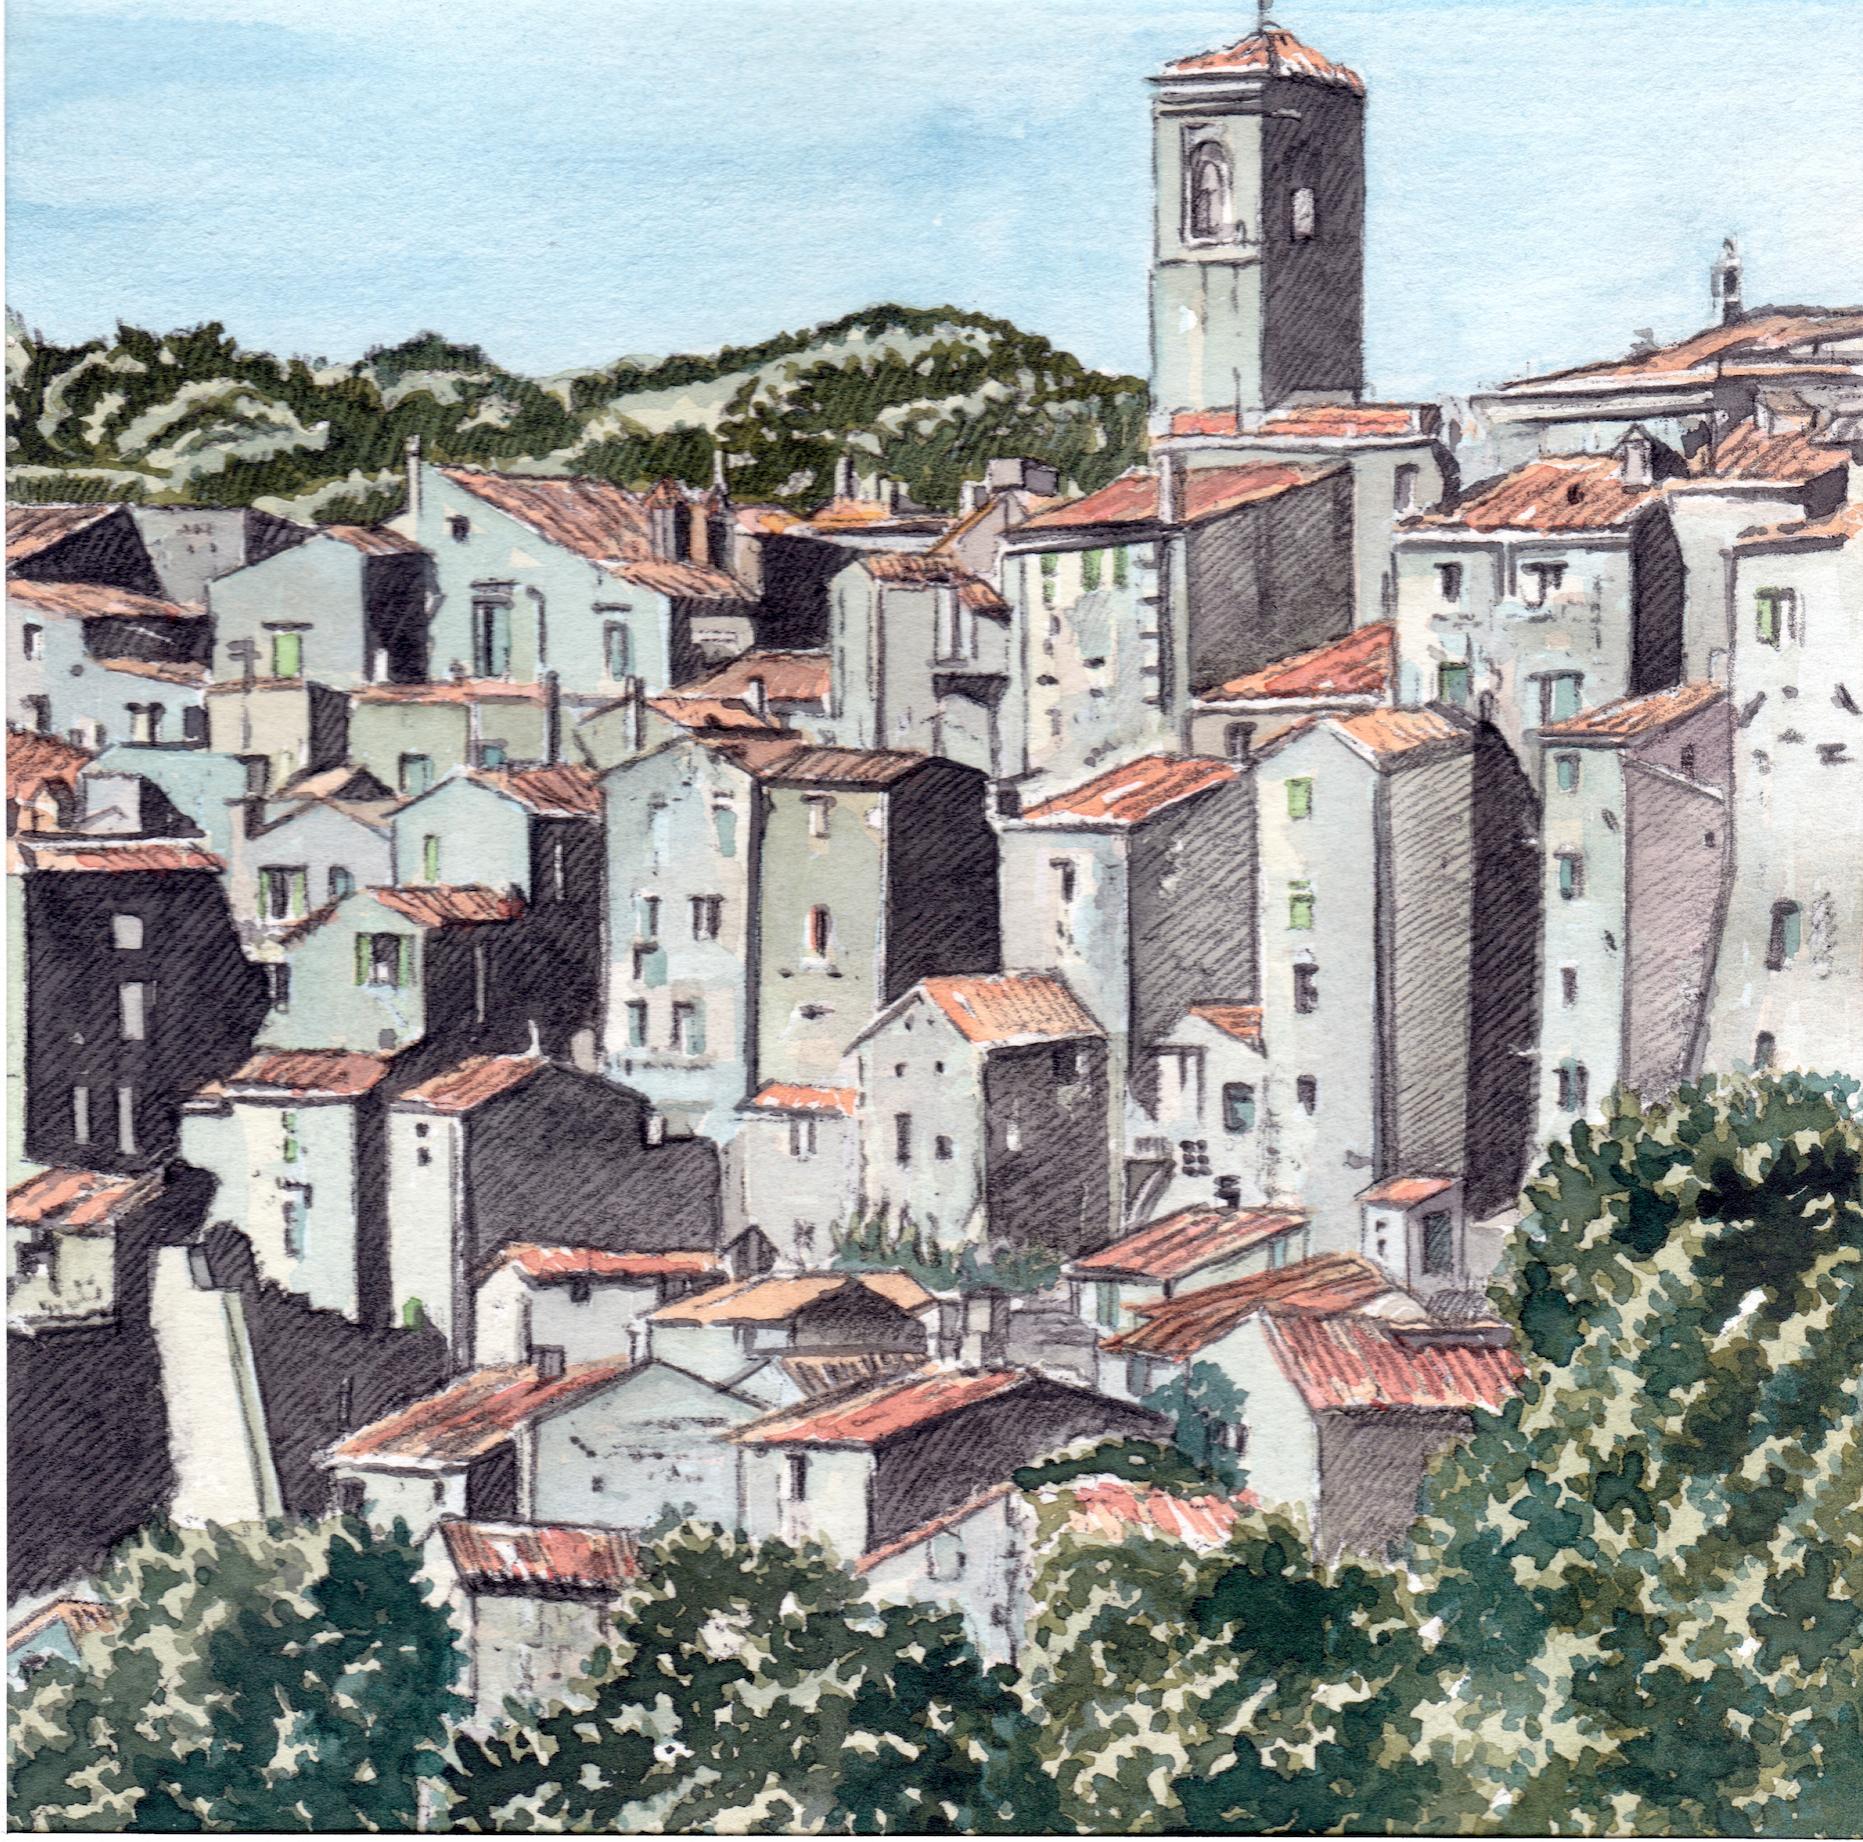 ' Sorano ' Toskana, Aquarell, 16 x 16 cm, 2006